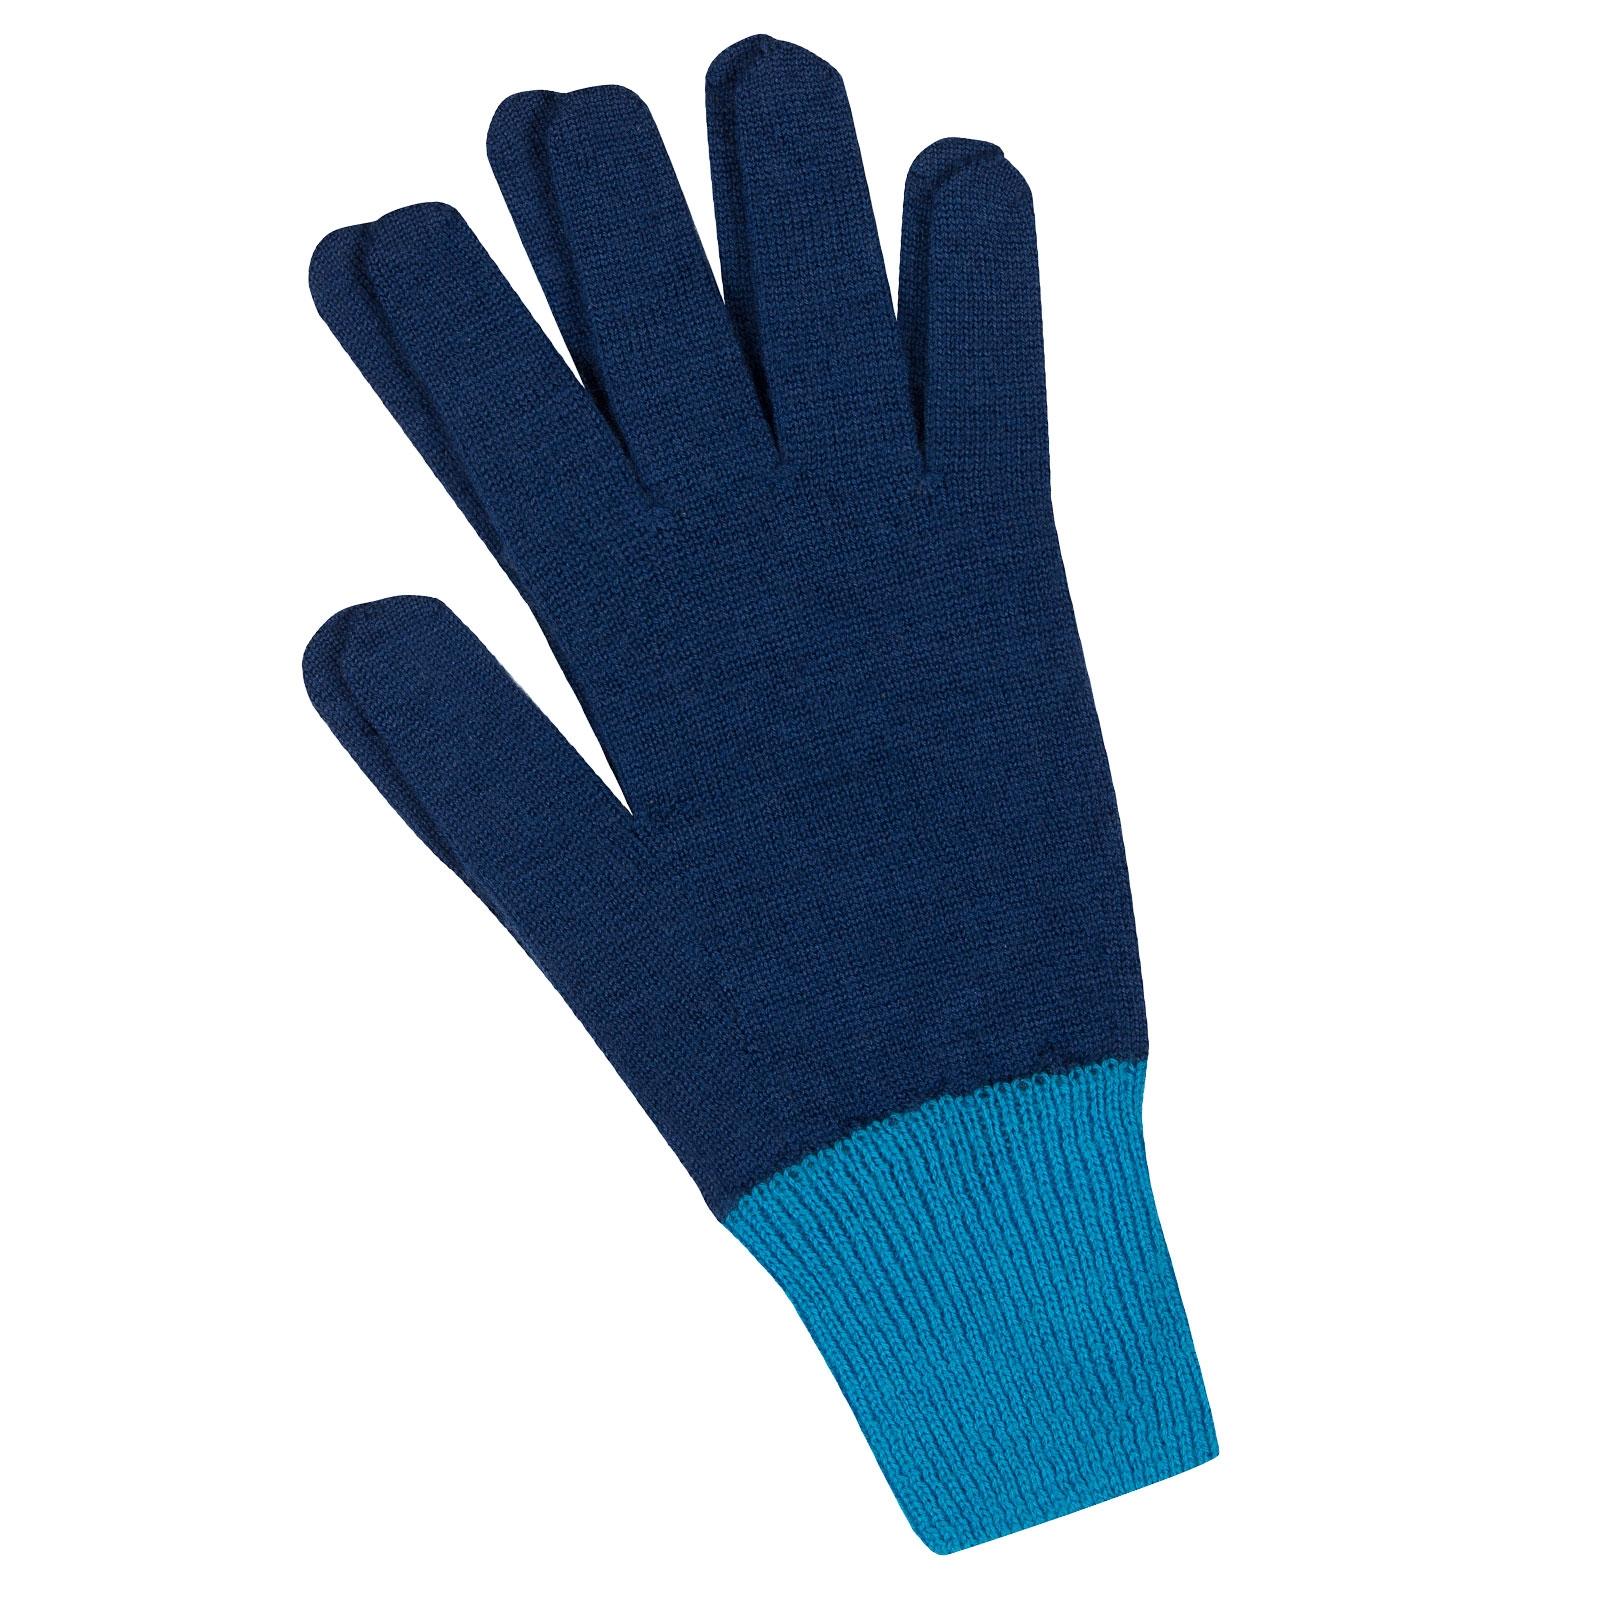 John Smedley Pasteur Merino Wool Gloves in Magnetic Cobalt-m/l